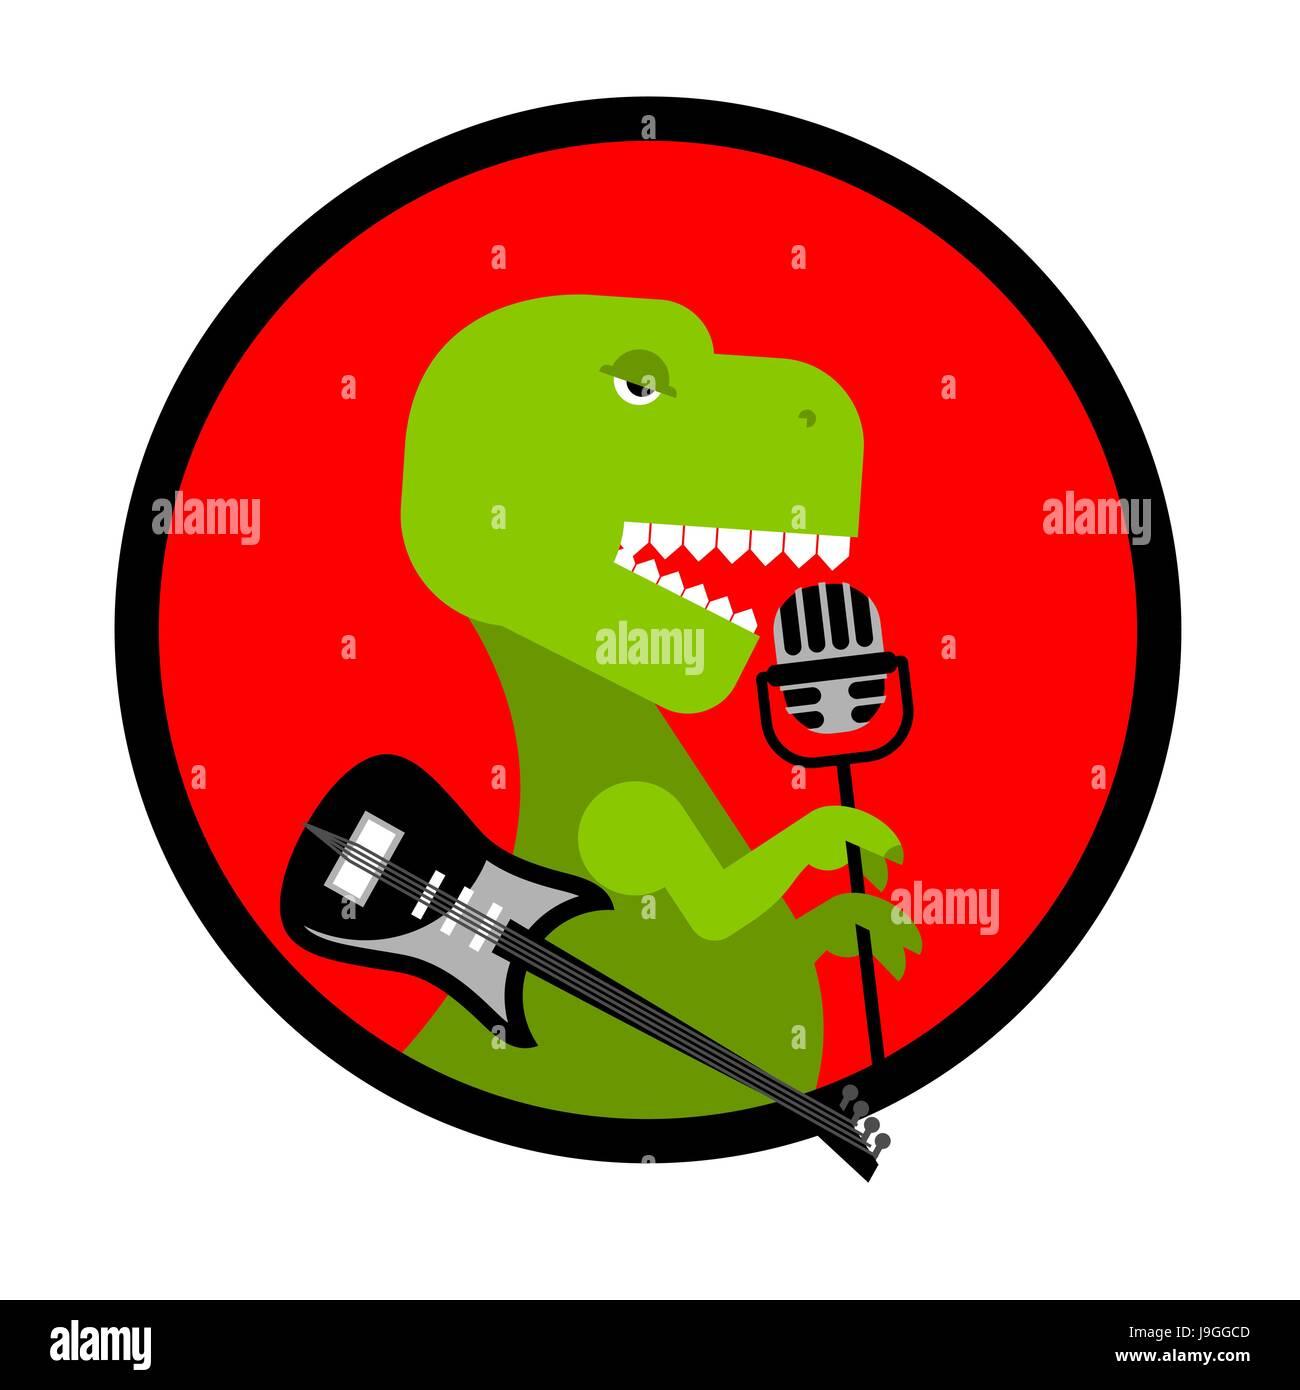 Tyrannosaurus Sings Song Dinosaur With Guitar Ancient Predator And Microphone